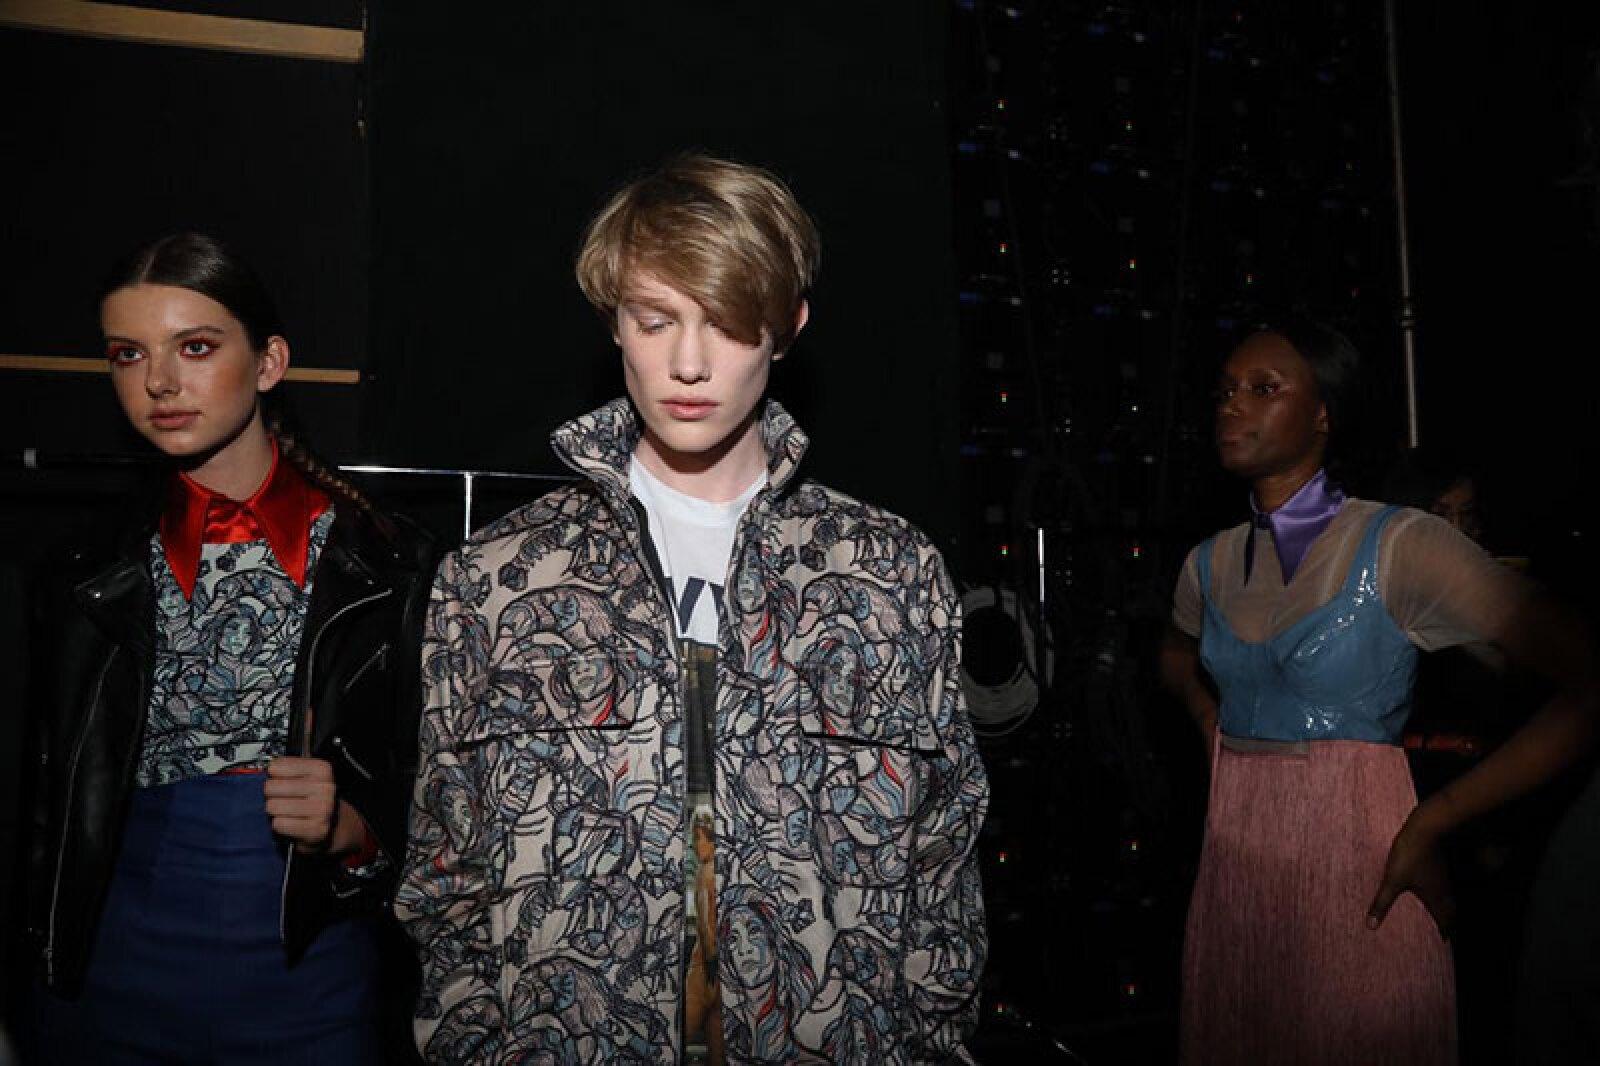 Desfile-Alexia-Ulibarri-MBFWM-Backstage-Outfit-2